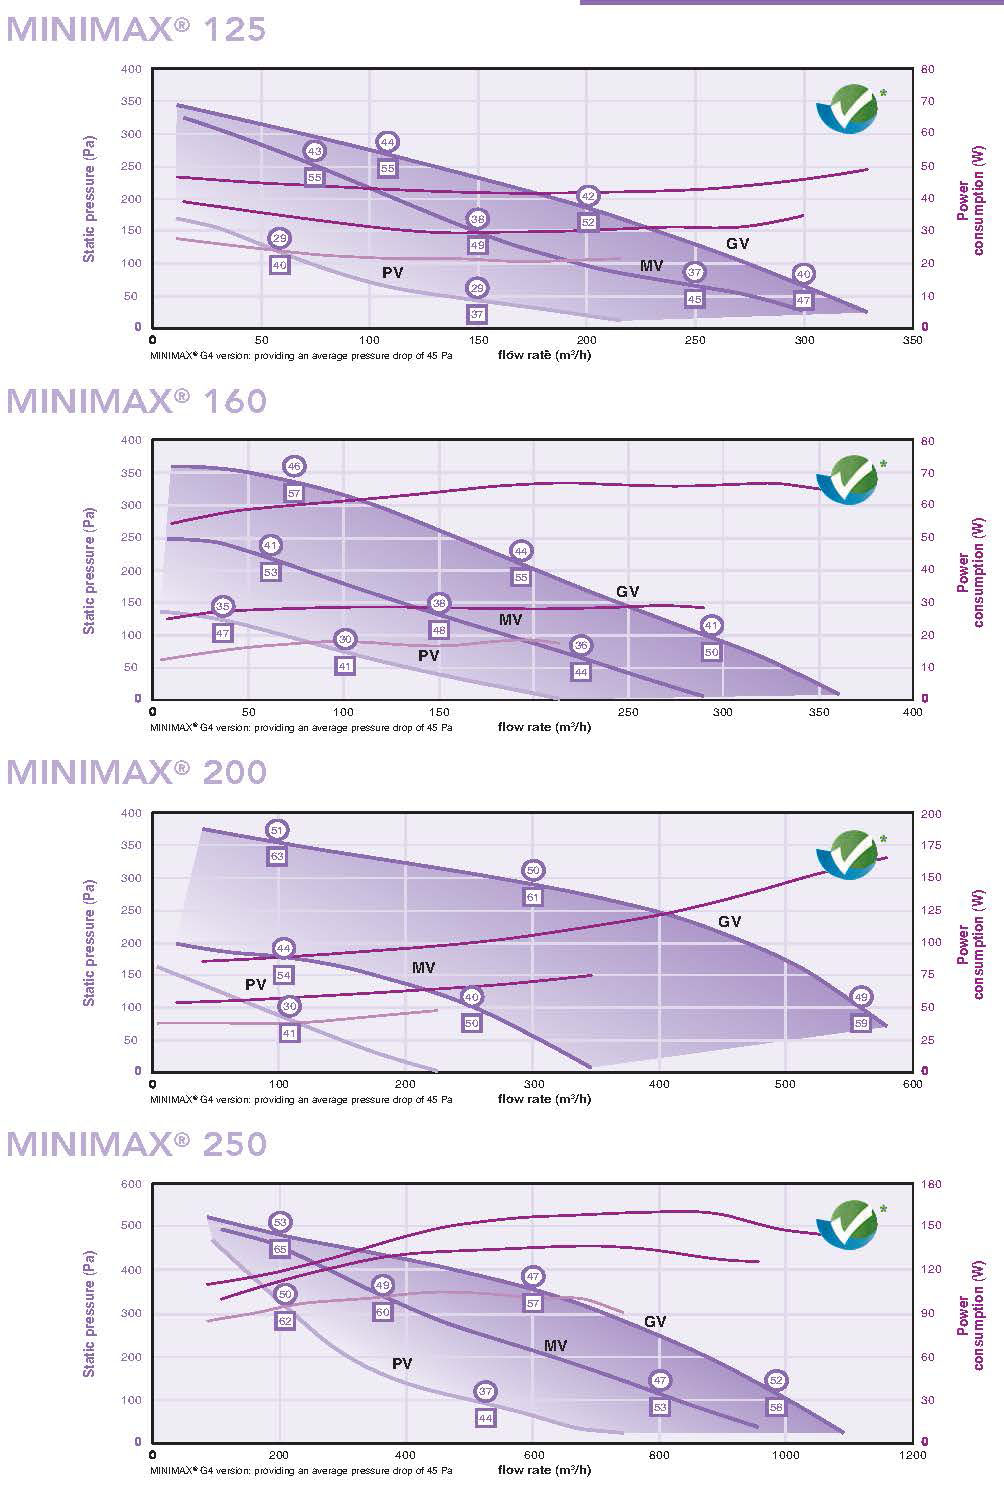 Minimax airflow rates